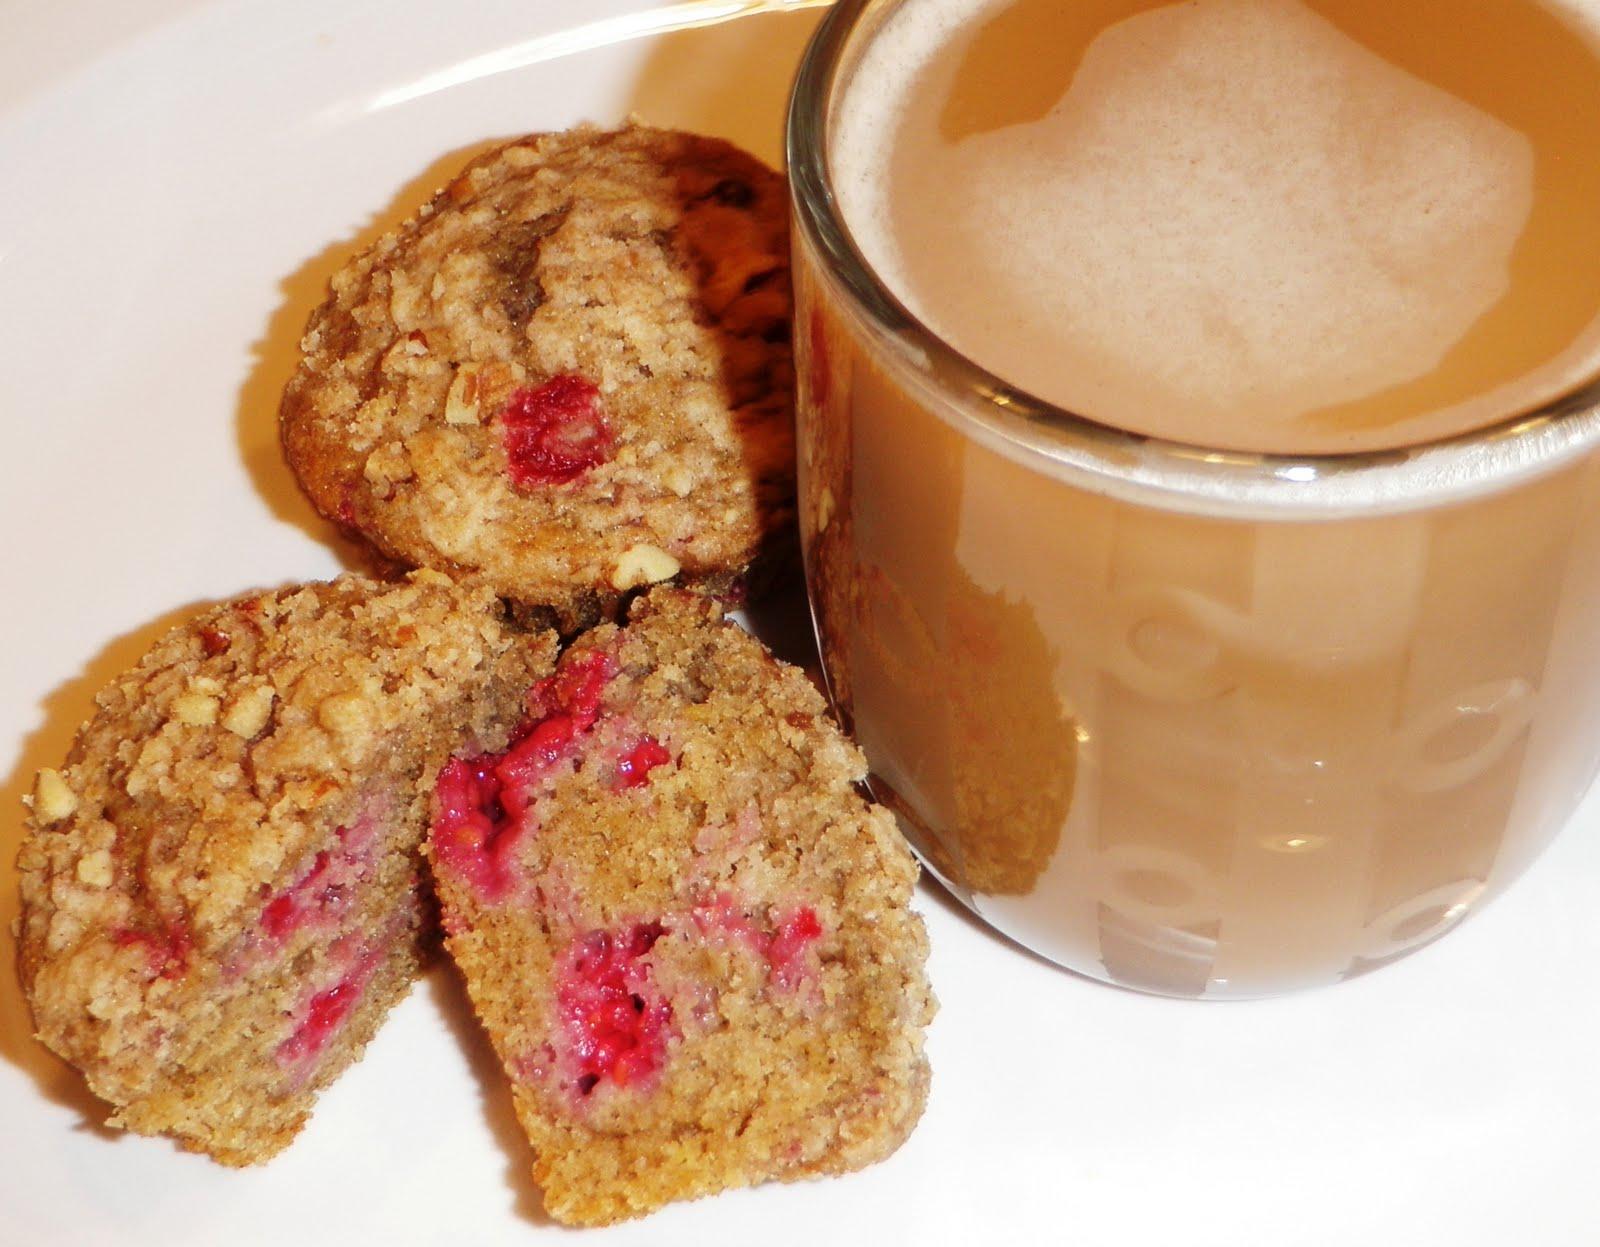 Sandra's Alaska Recipes: SANDRA'S RASPBERRY-LEMON STREUSEL MUFFINS